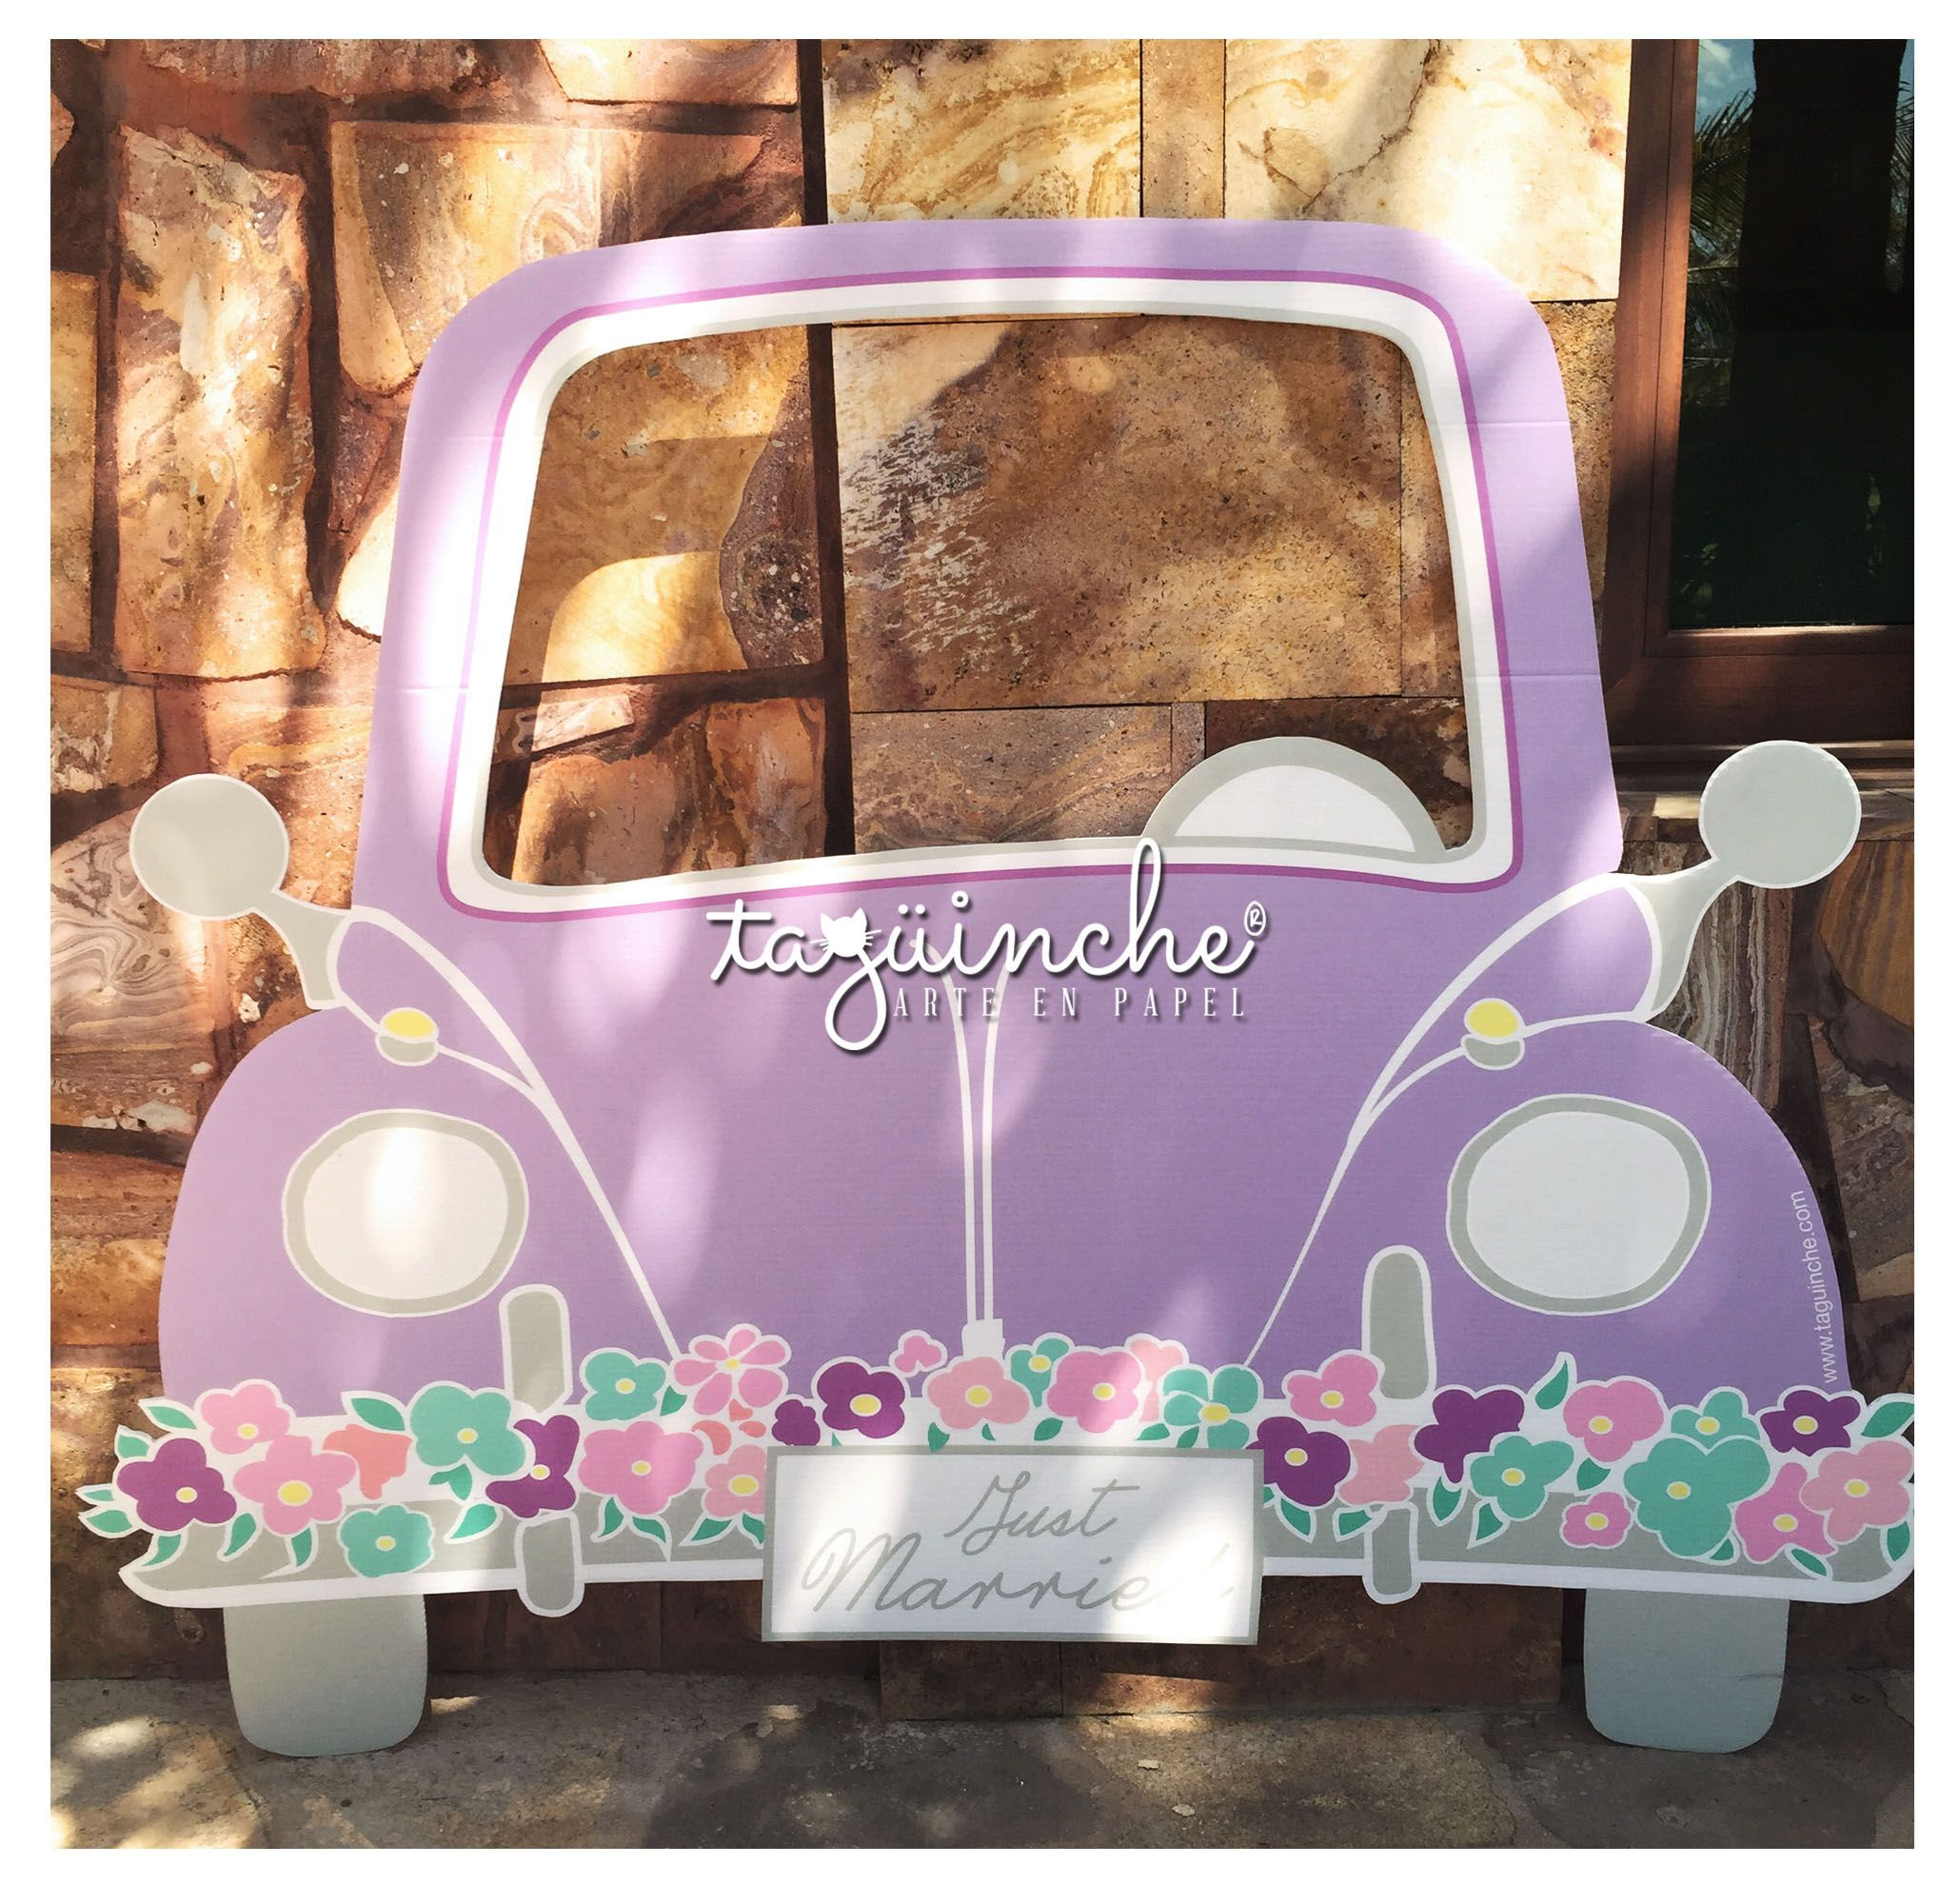 Marco para fotos www.taguinche.com | auto | Pinterest | Photo booth ...